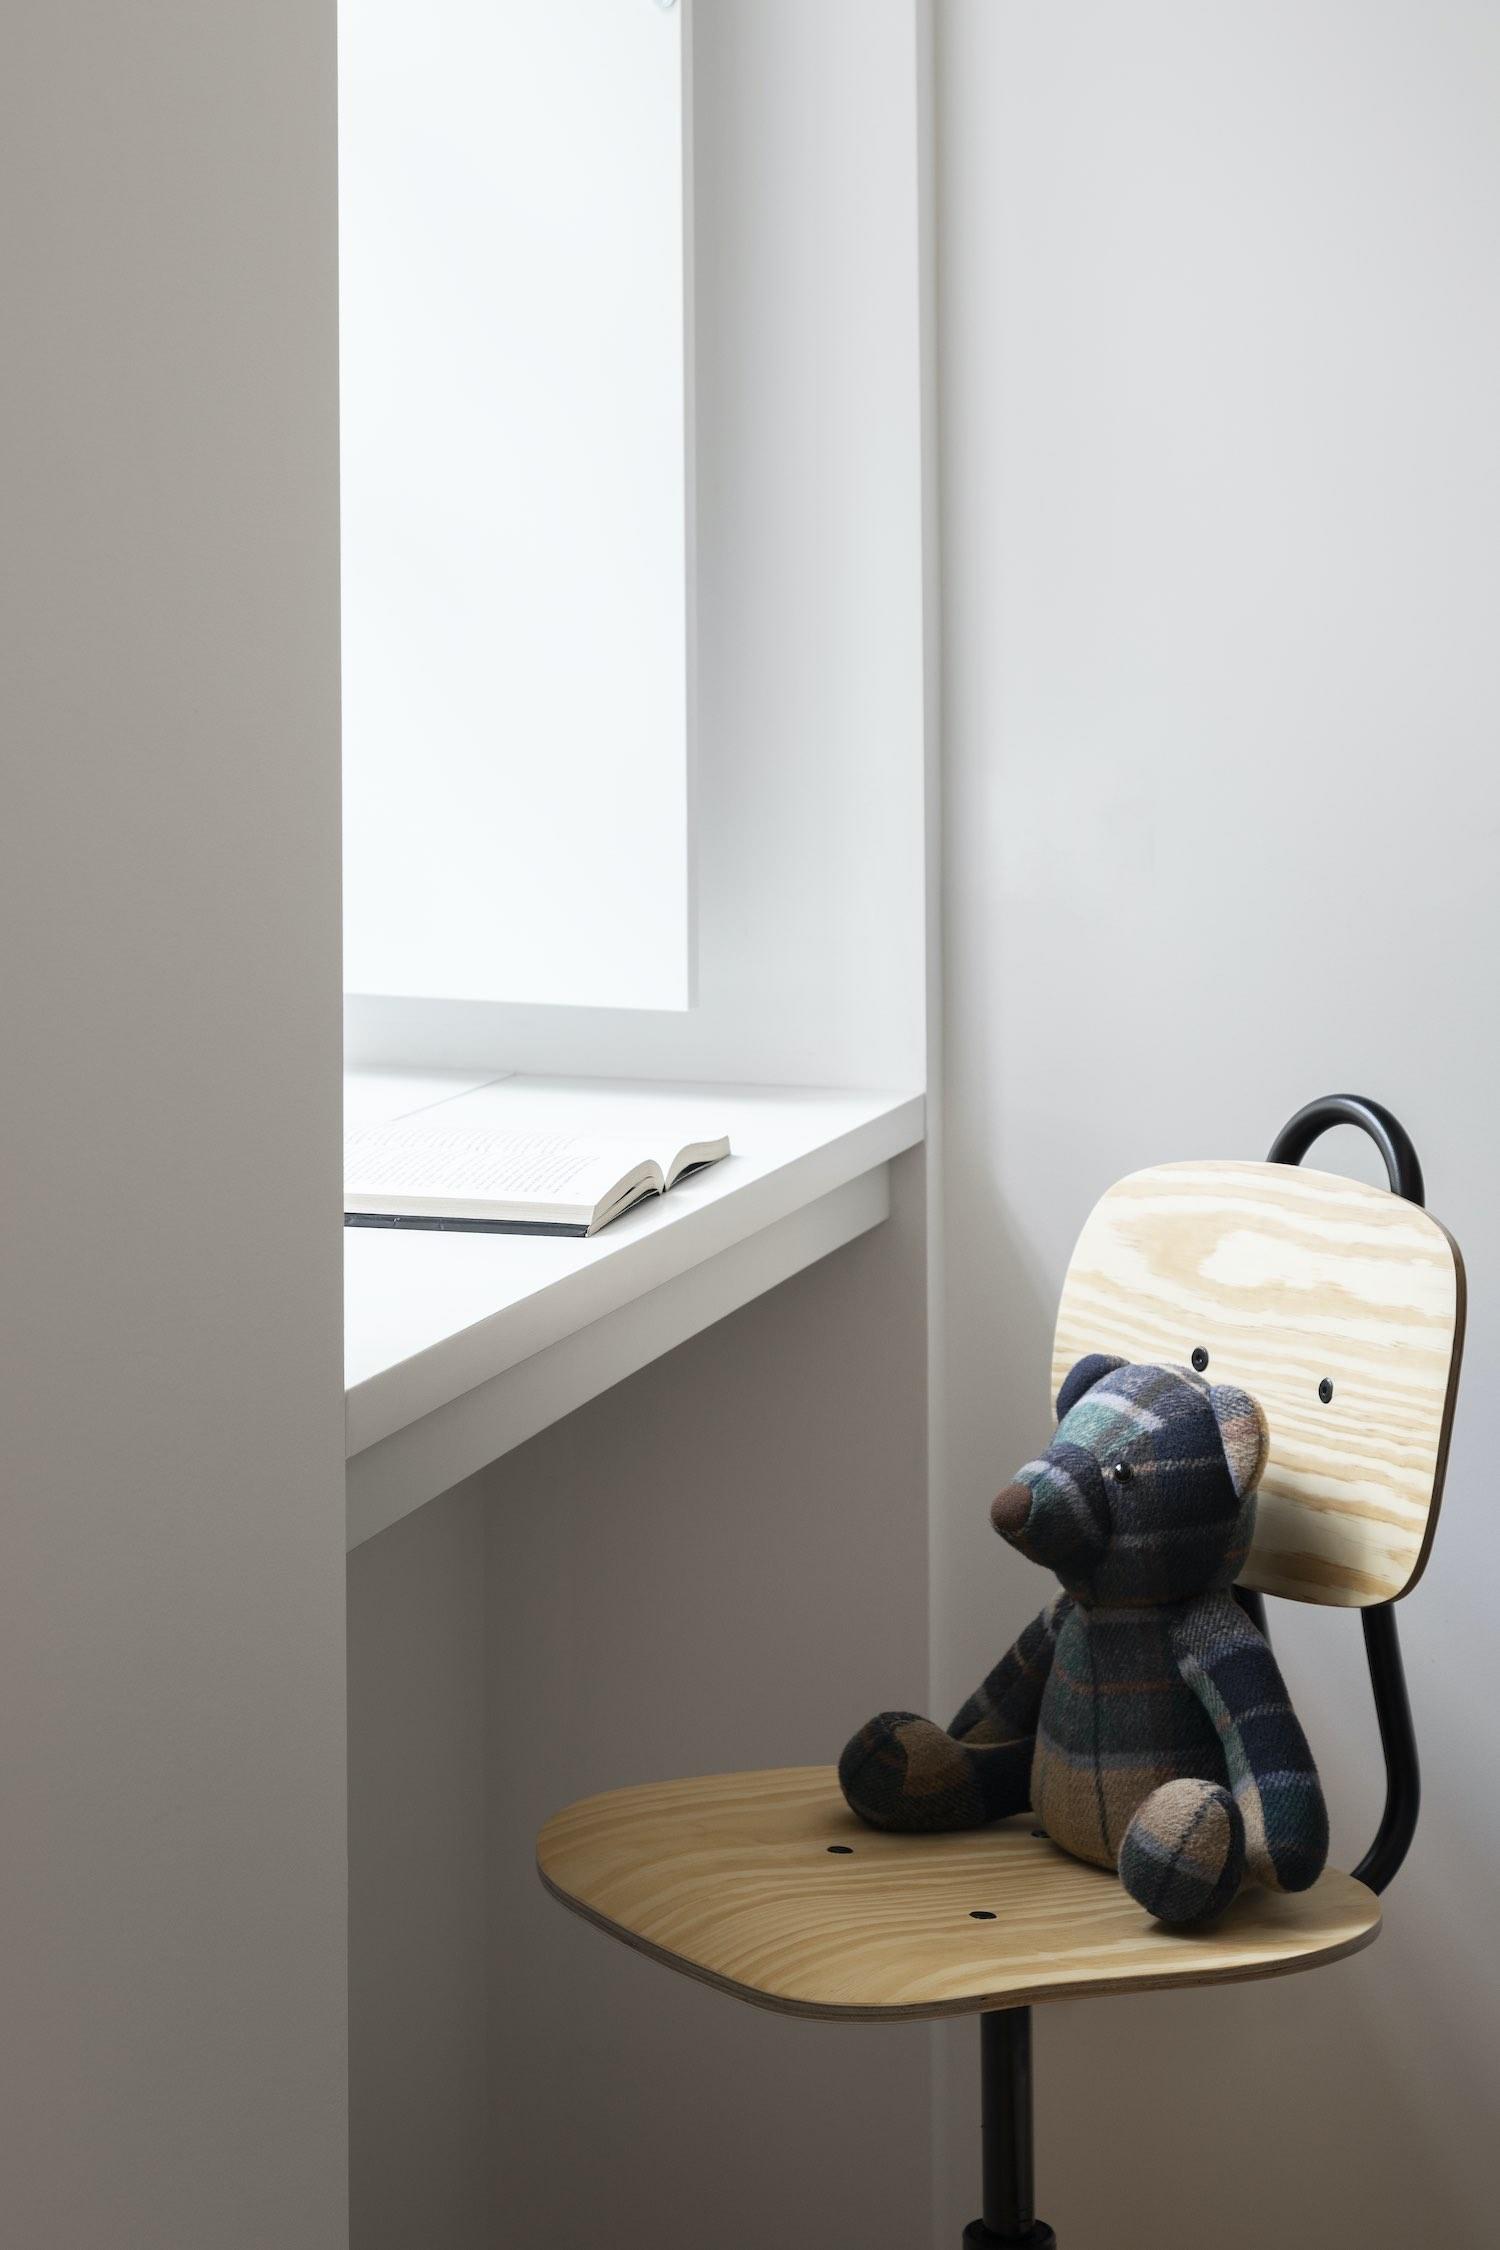 tedy bear toy on chair